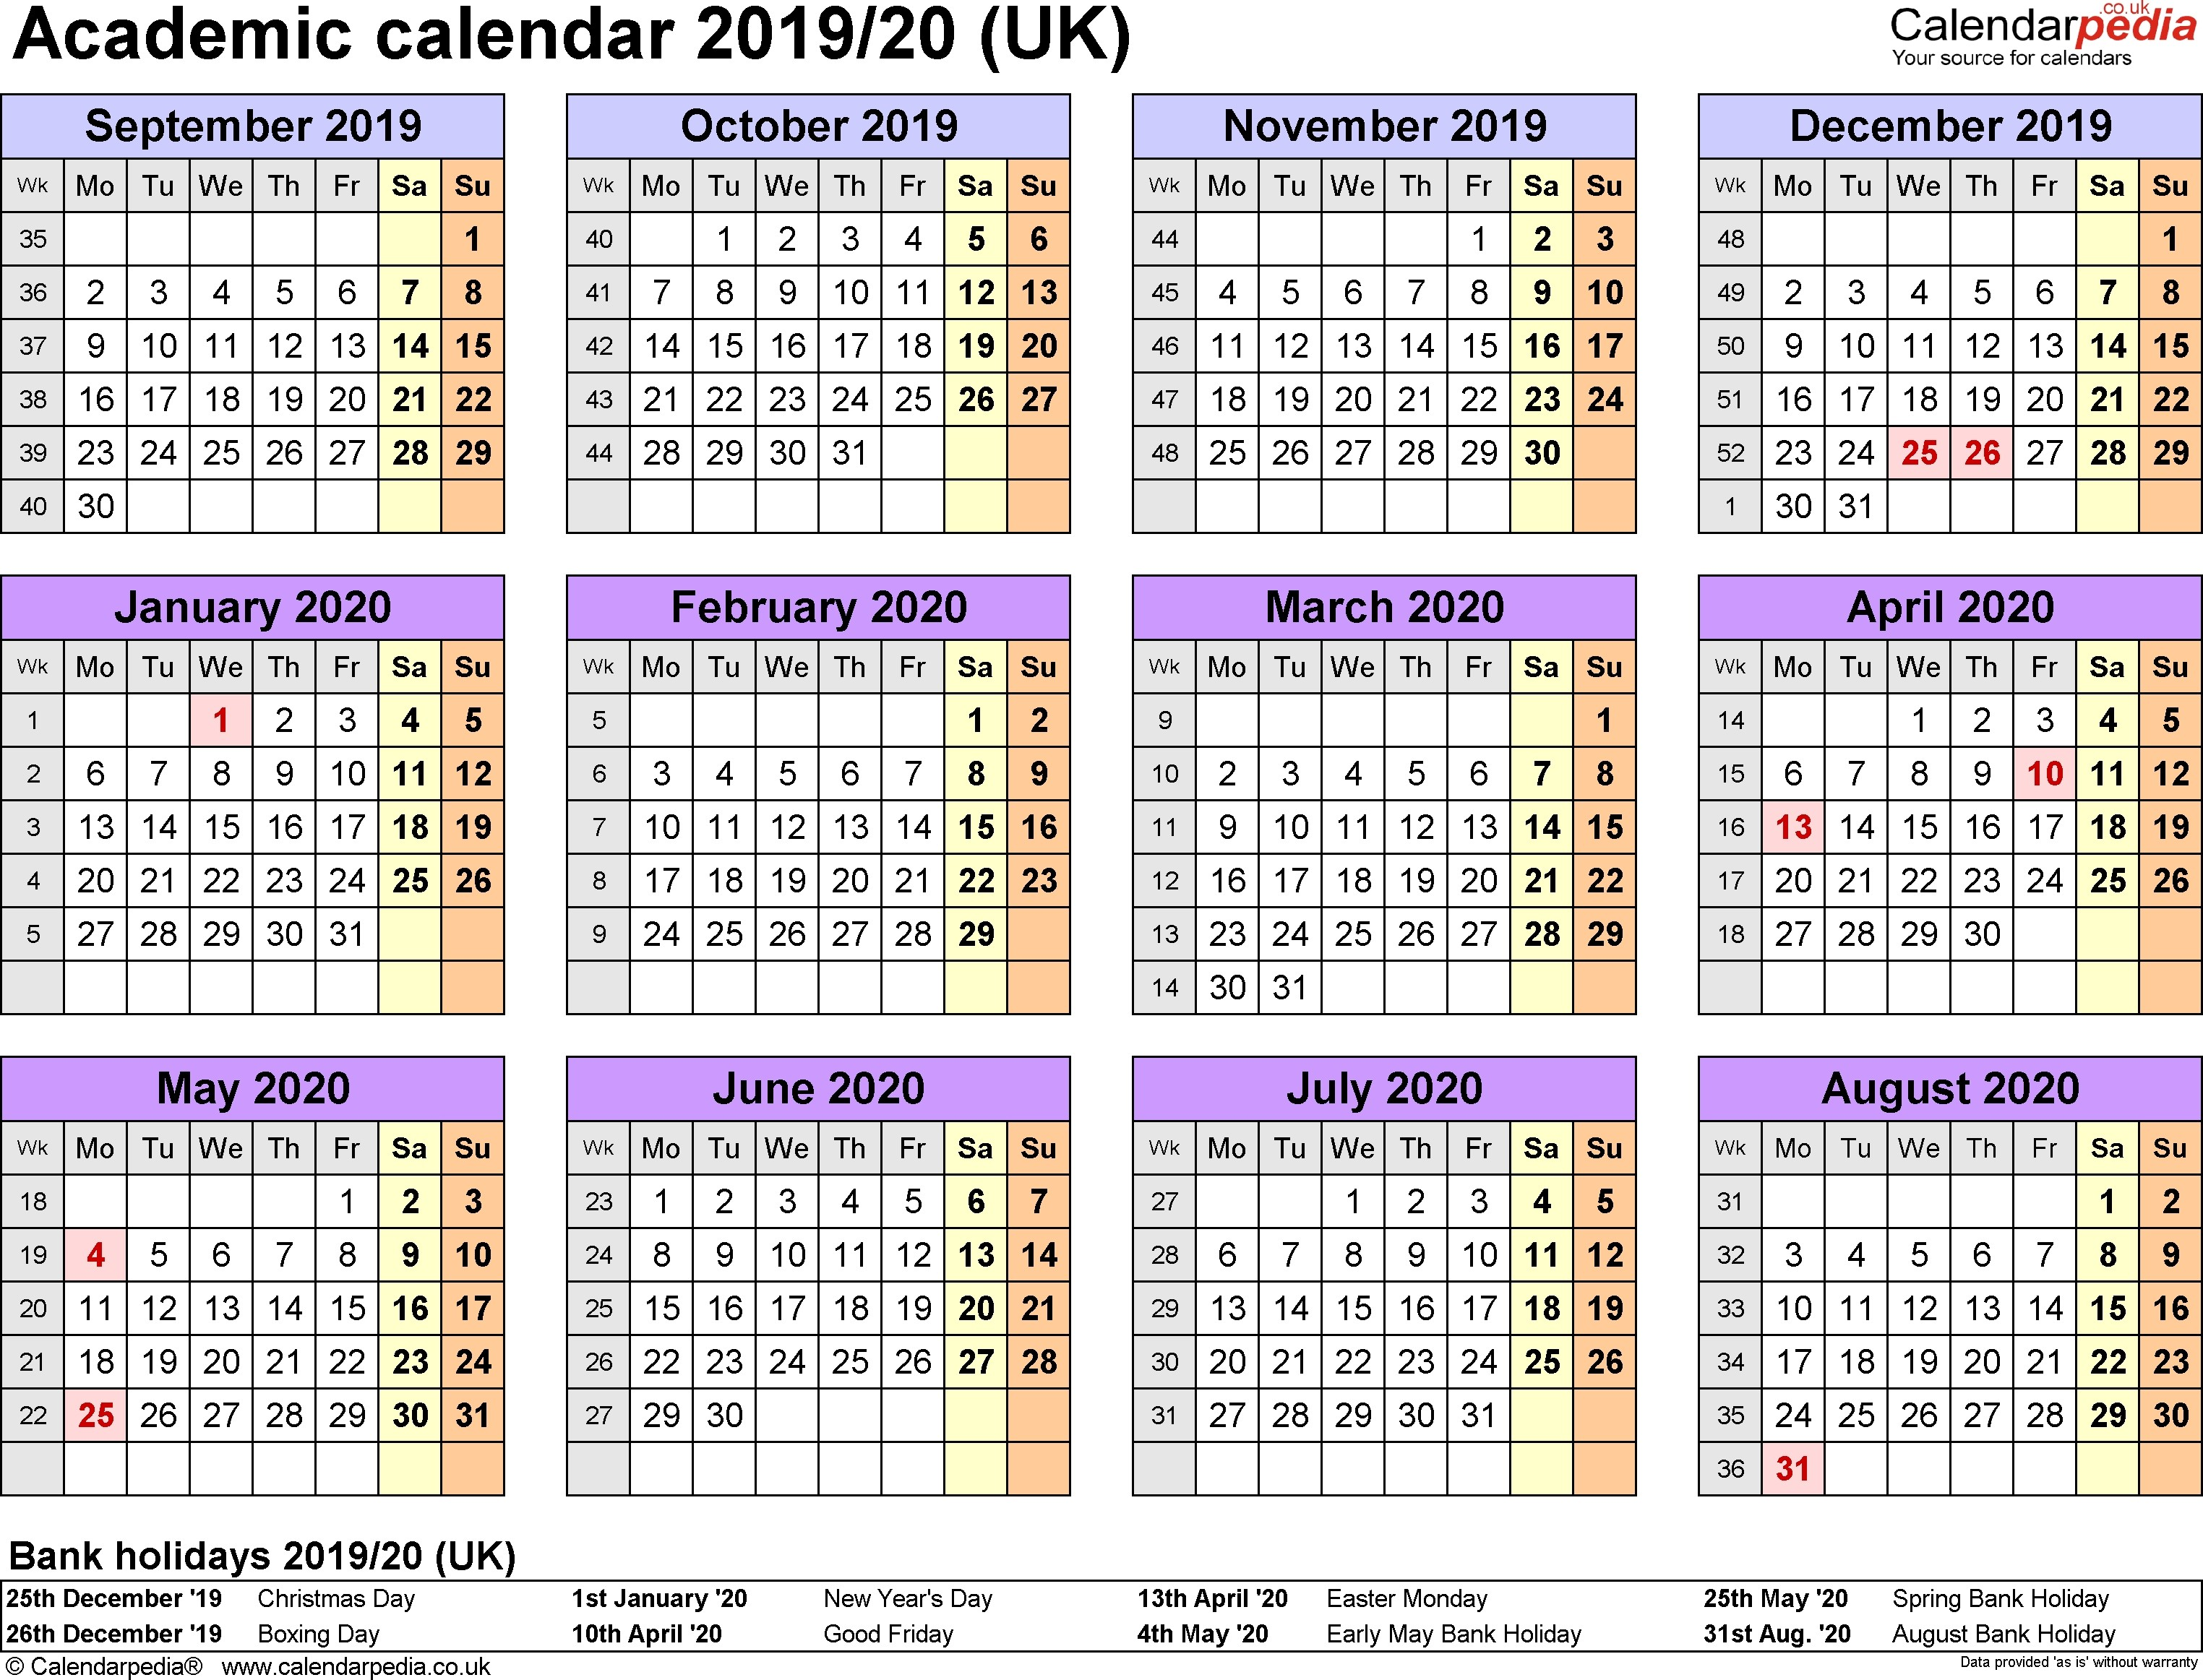 school holidays 2019 calendar uk usa qld nz england nsw april 1